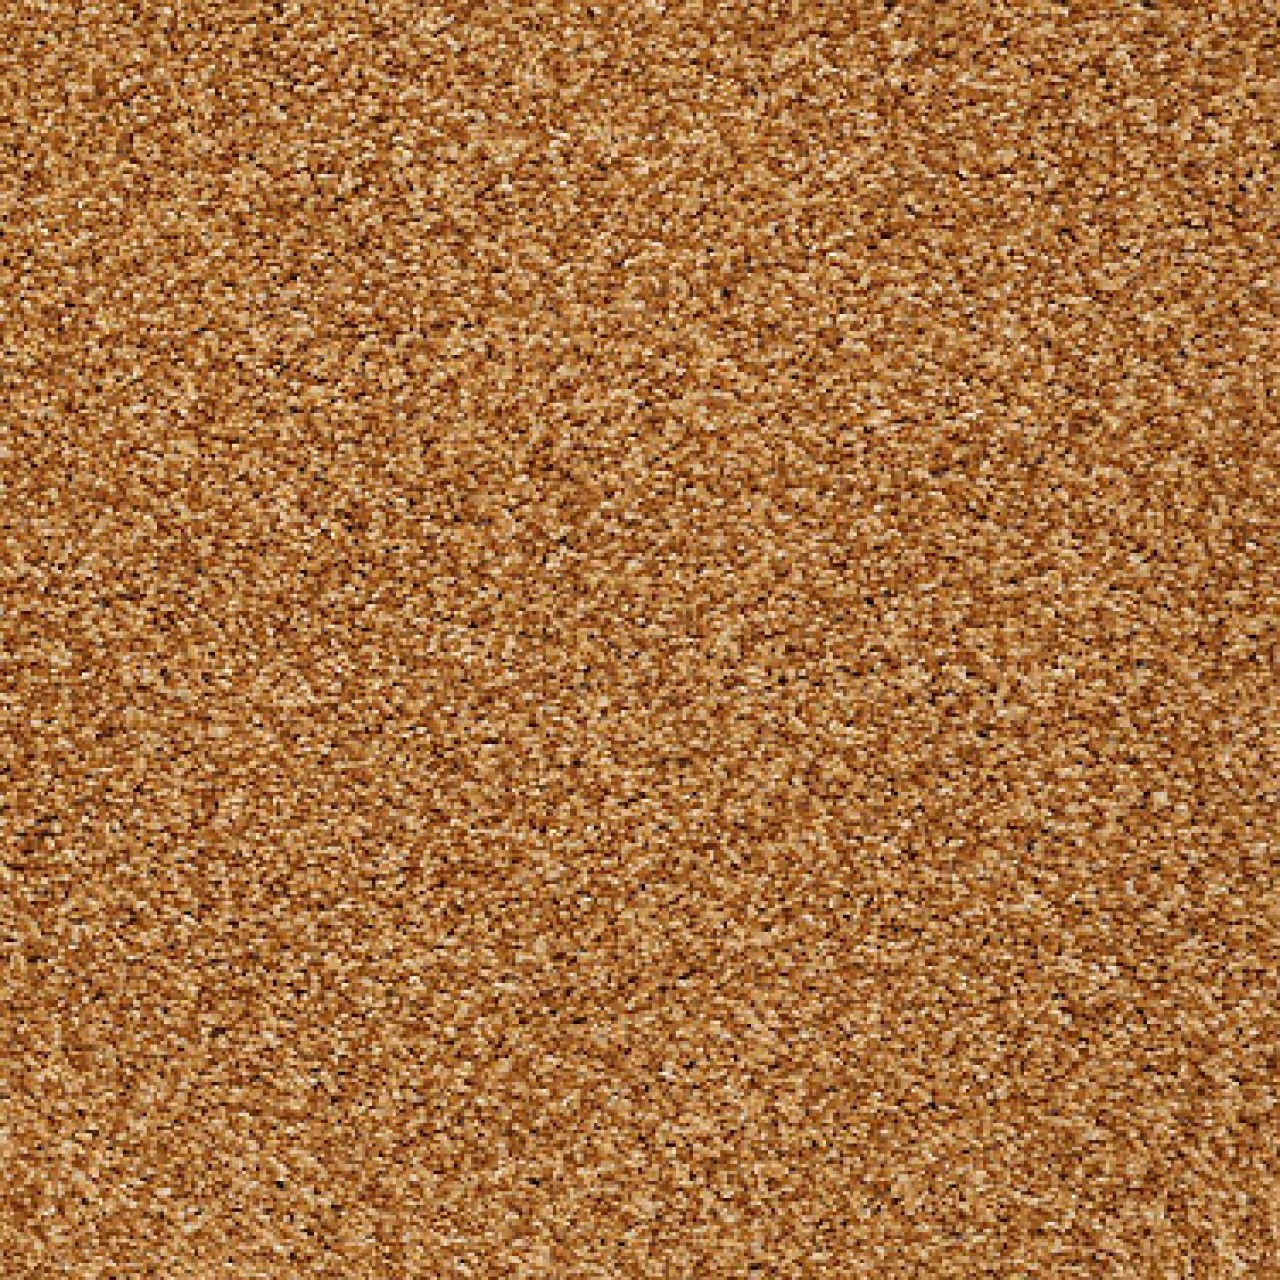 664-Inca-Gold-Days-Like-This-Shaw-Tuftex-Carpet